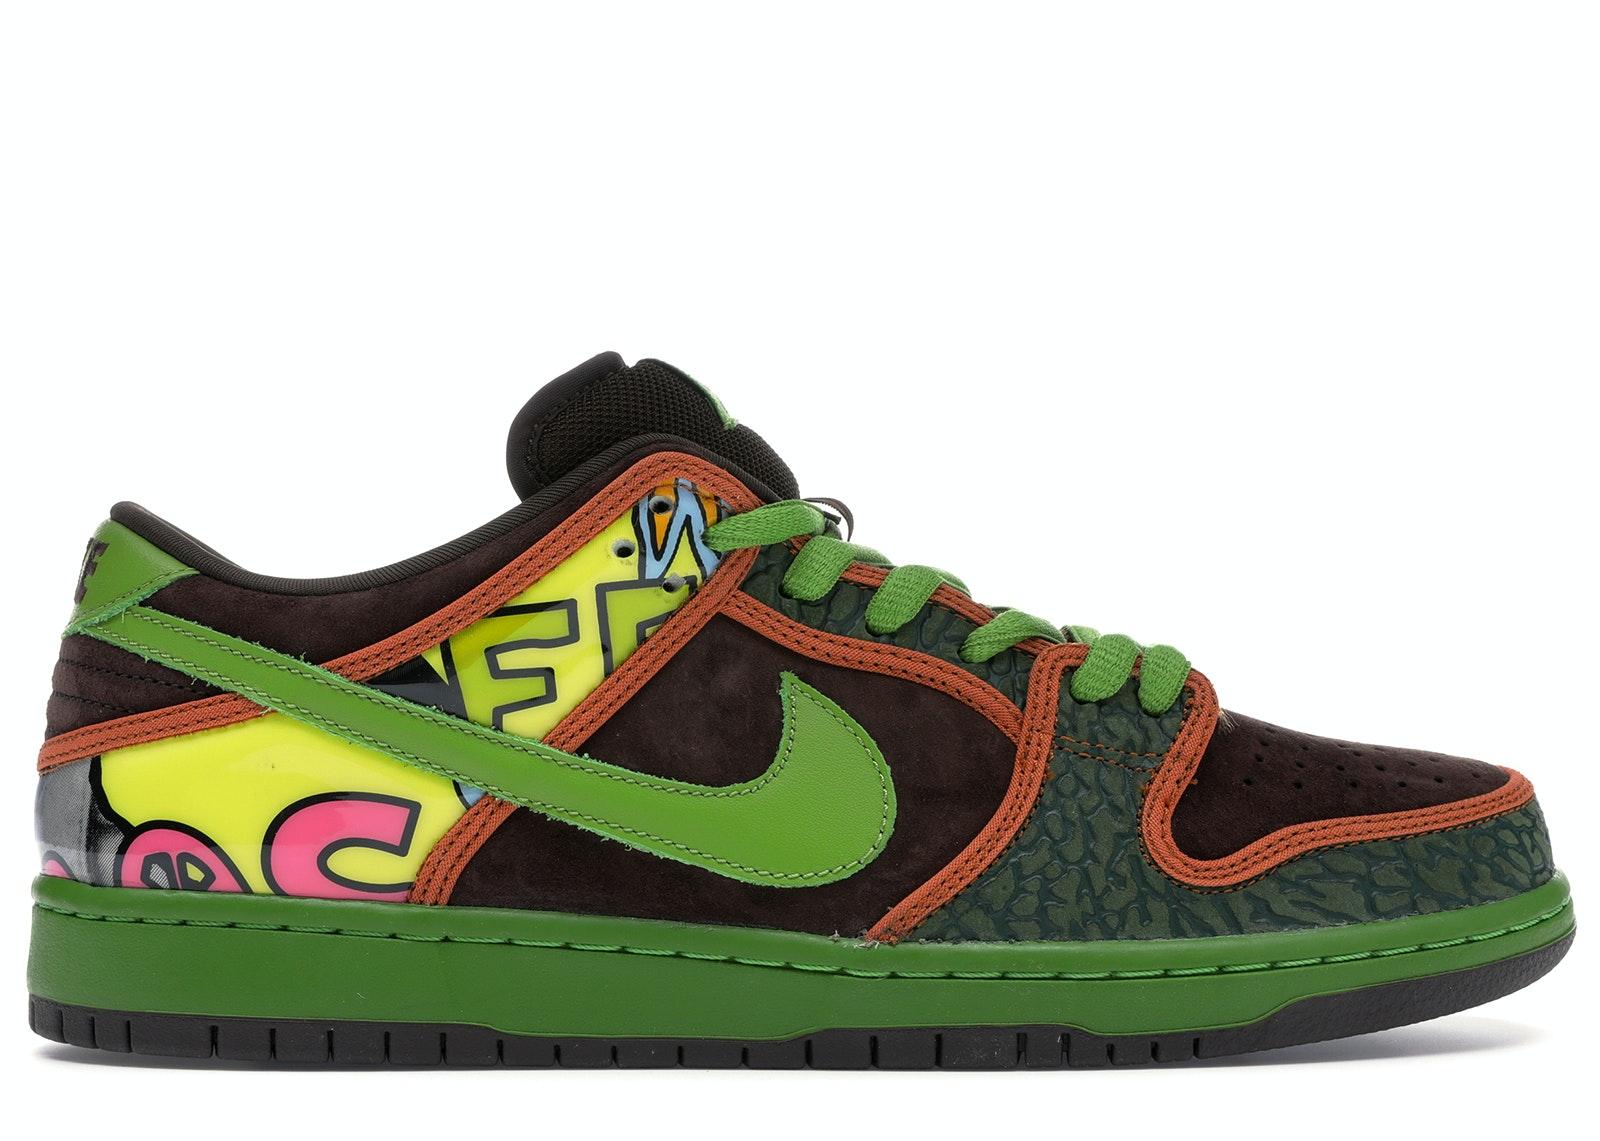 Nike Dunk SB Low De La Soul (2015)